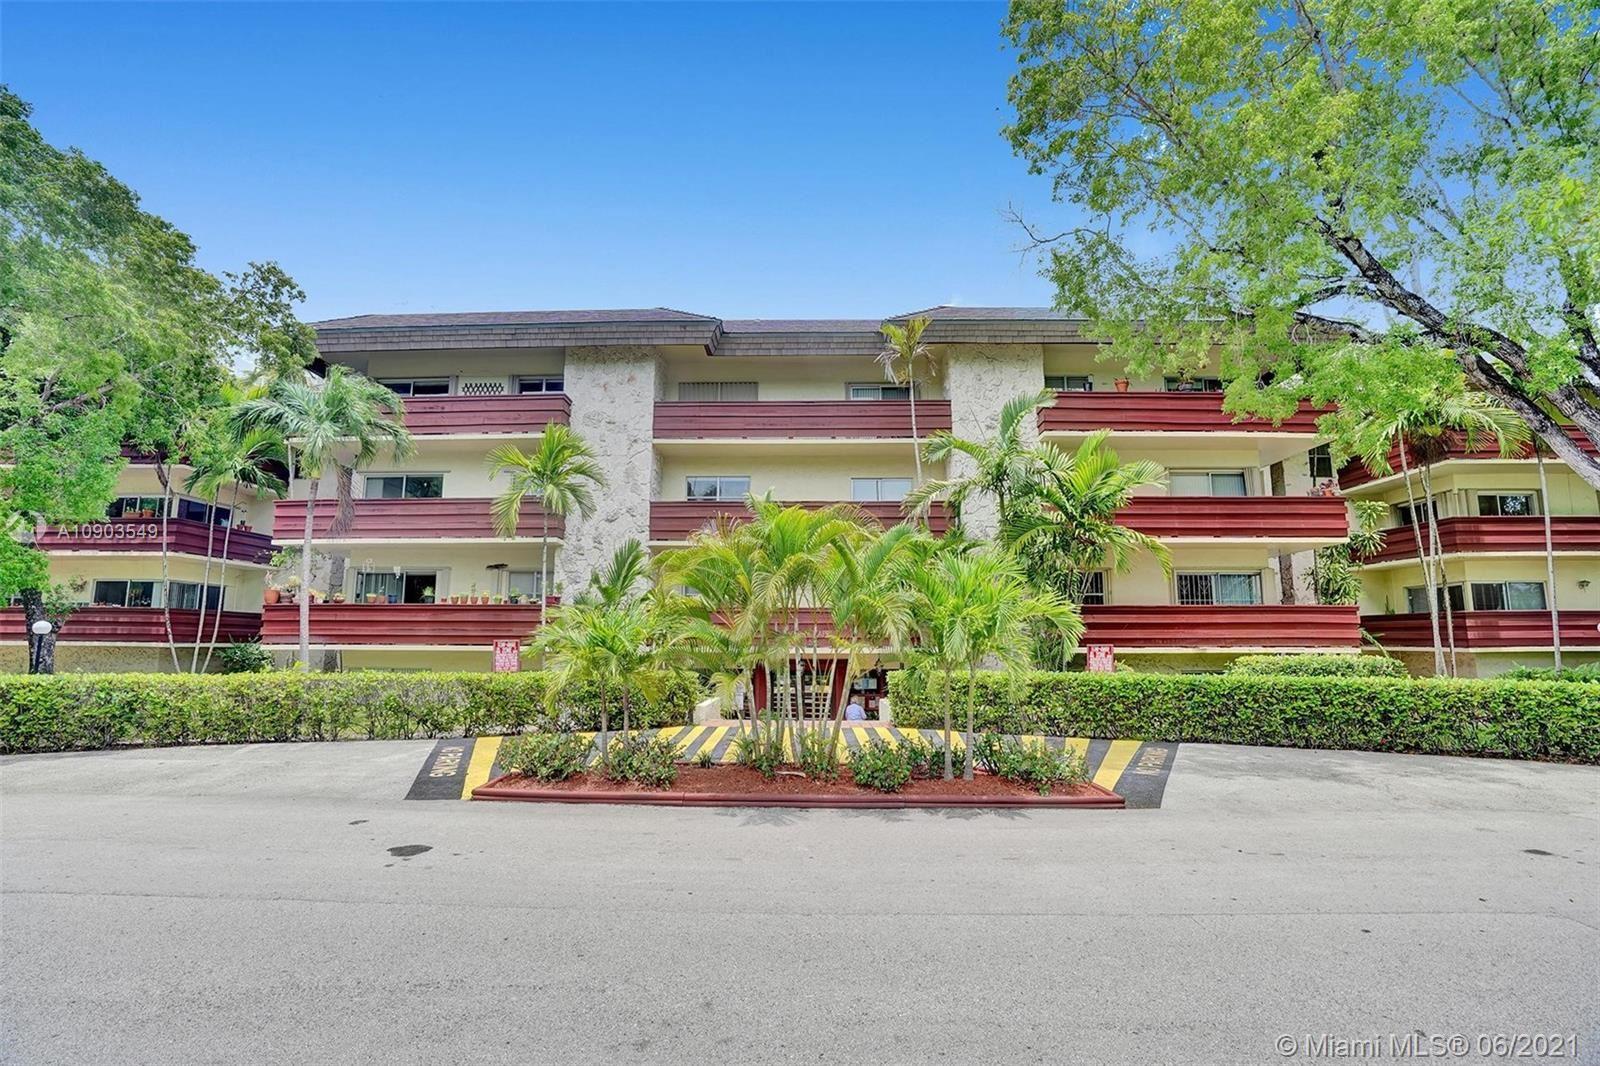 1205 Mariposa Ave #333, Coral Gables, FL 33146 - #: A10903549